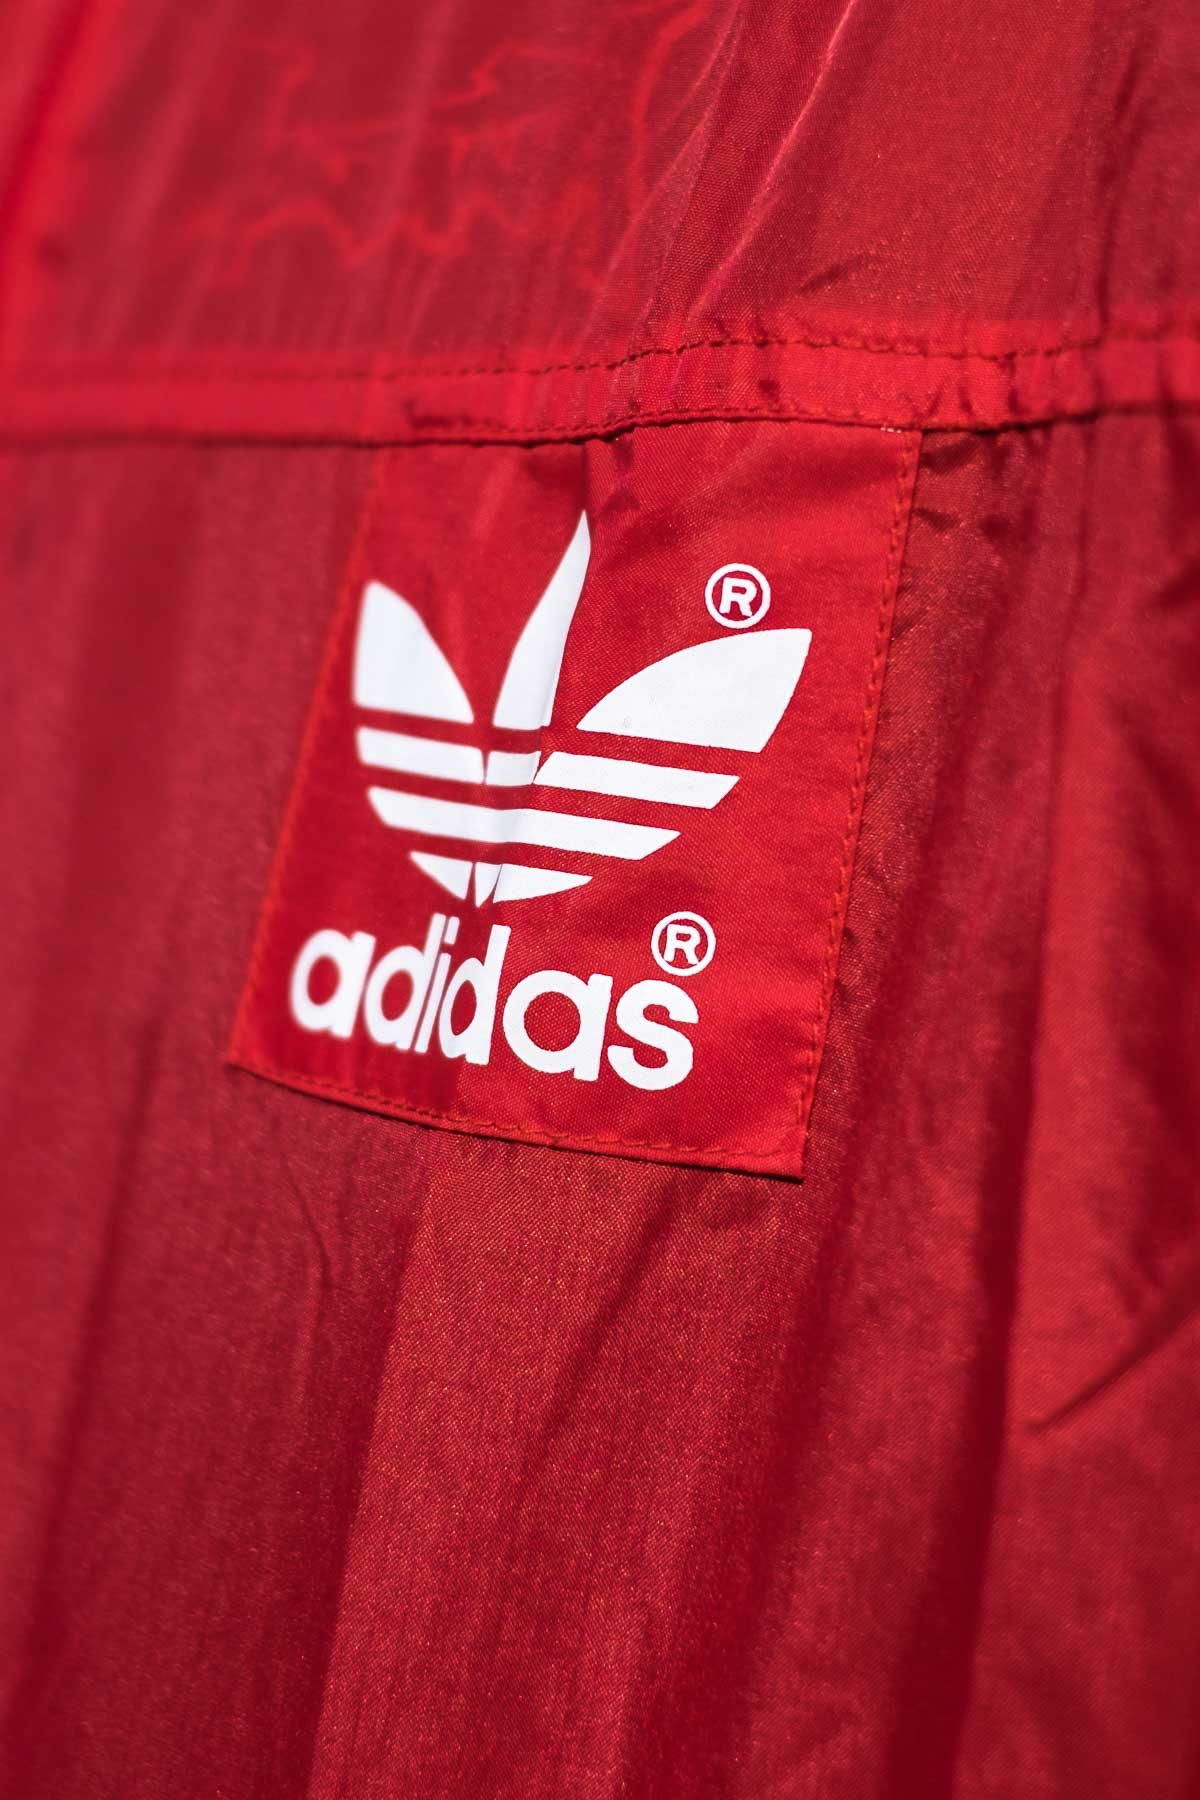 Adidas GIACCA A VENTO VINTAGE 90S Rosso